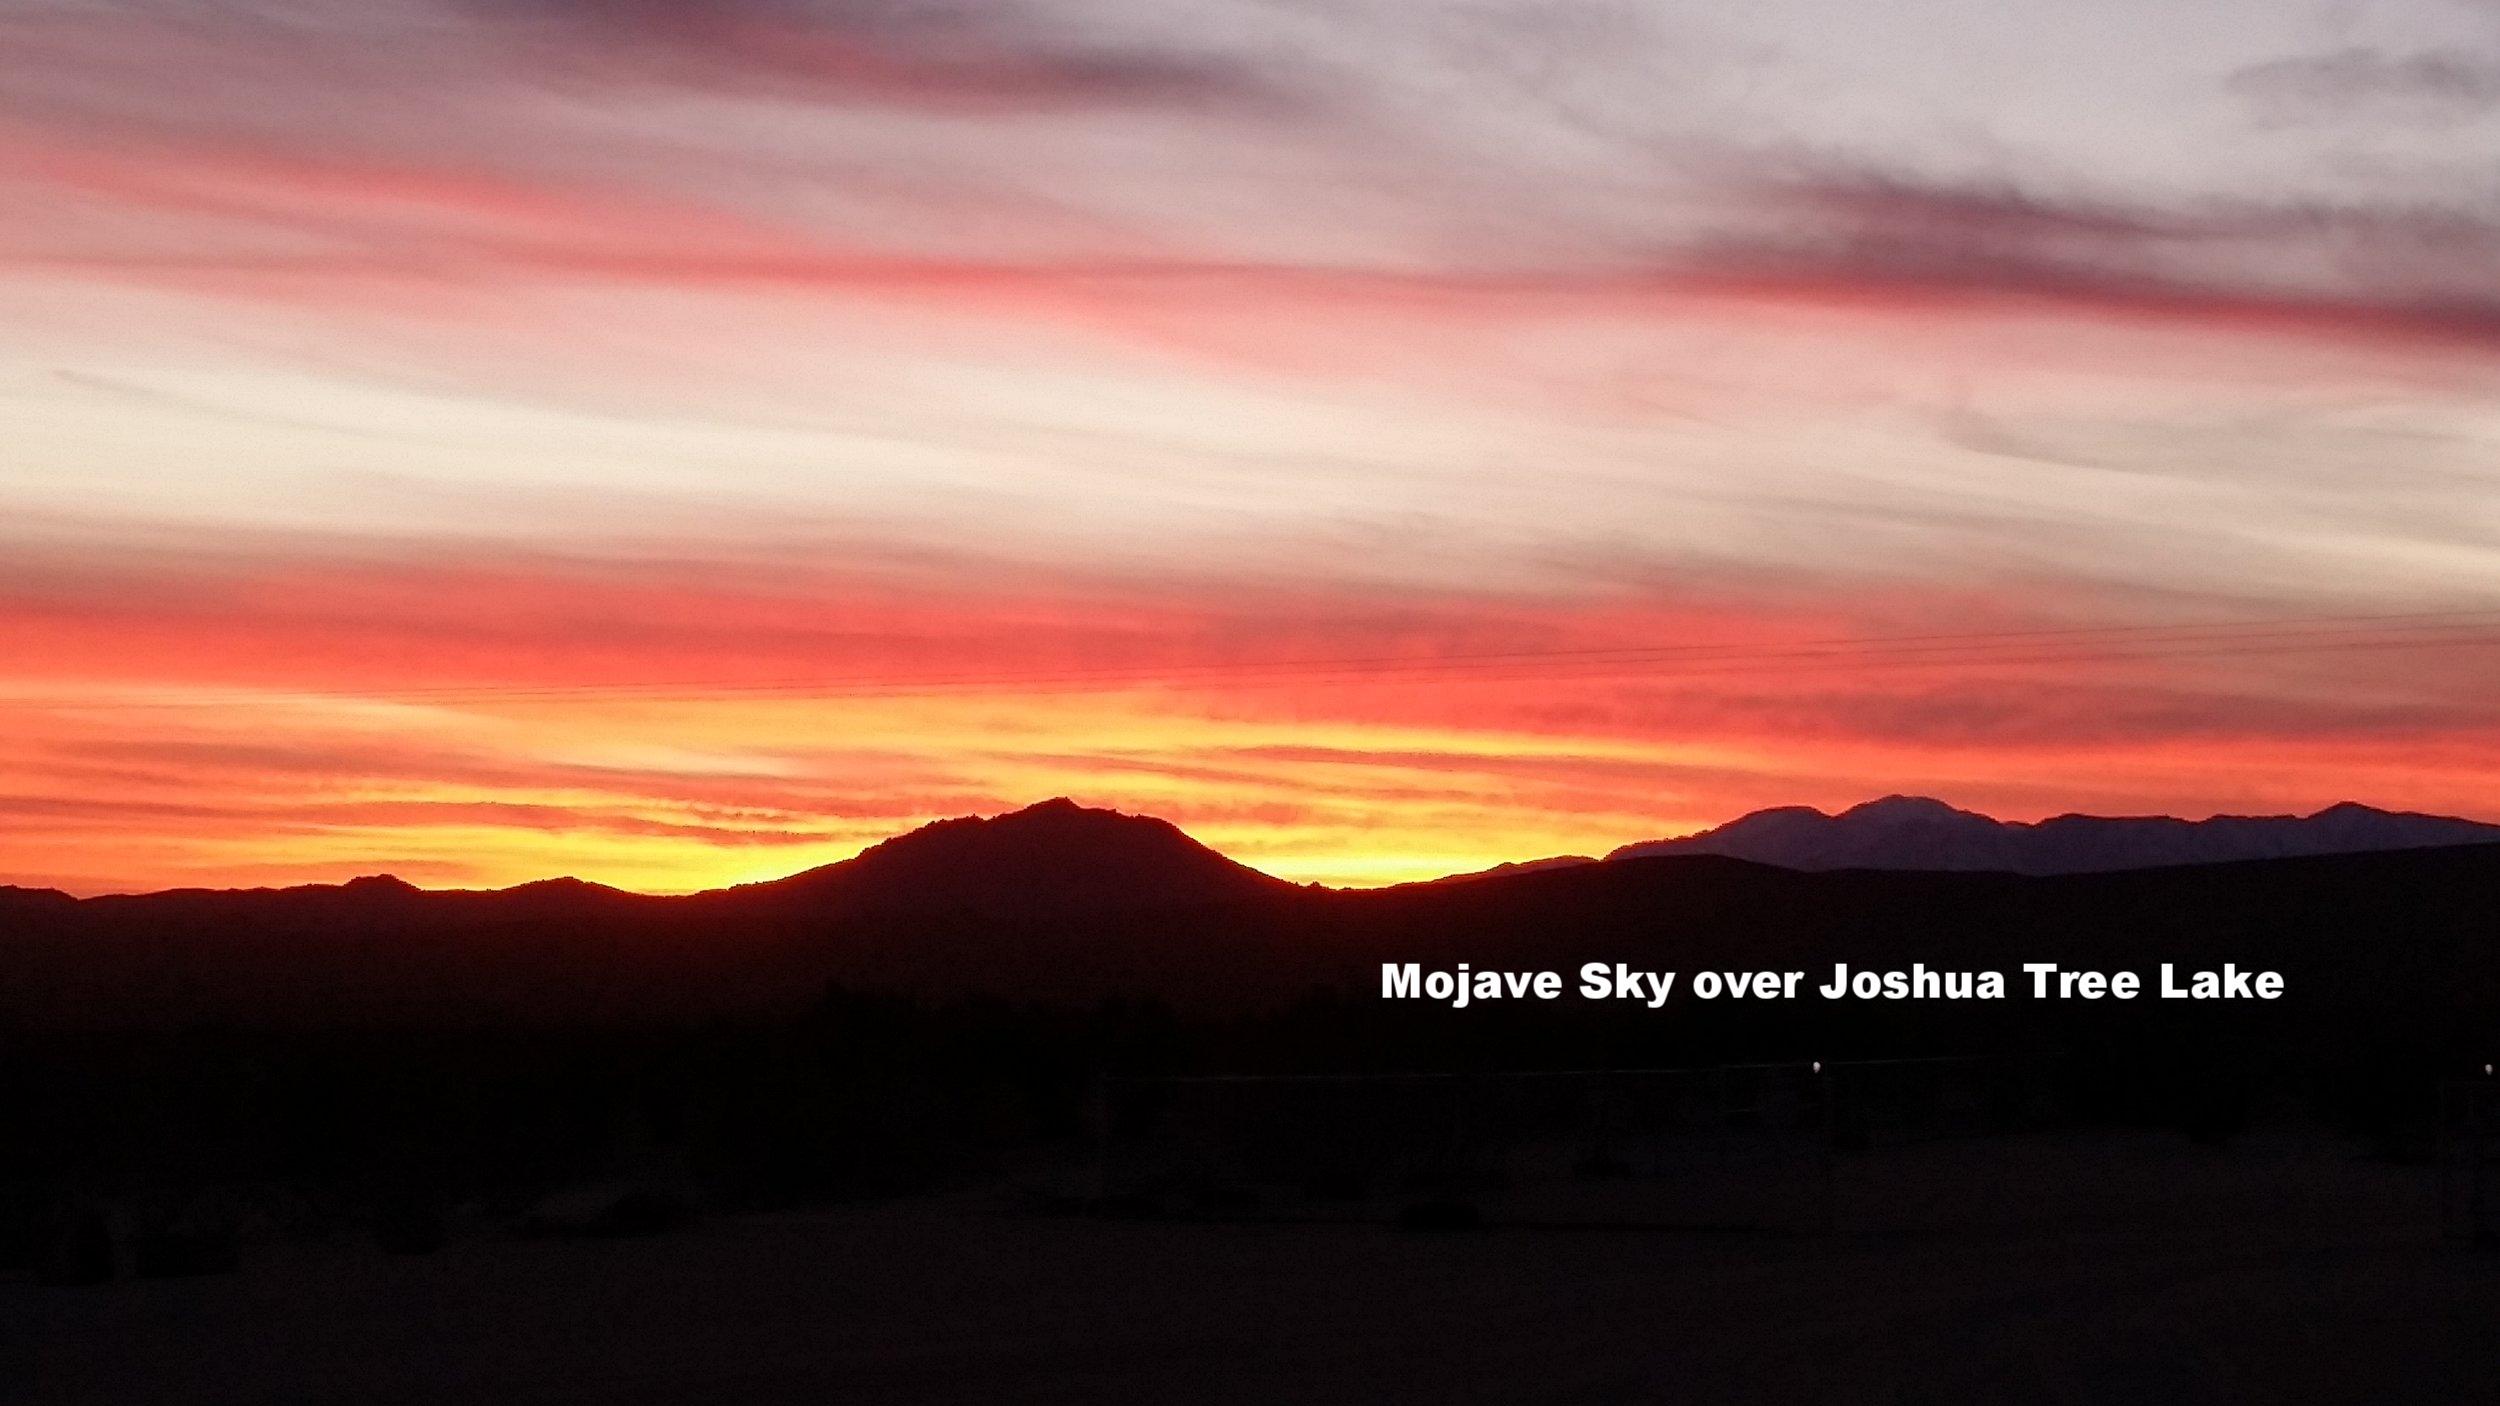 Mojave Sky over Joshua Tree Lake.jpg